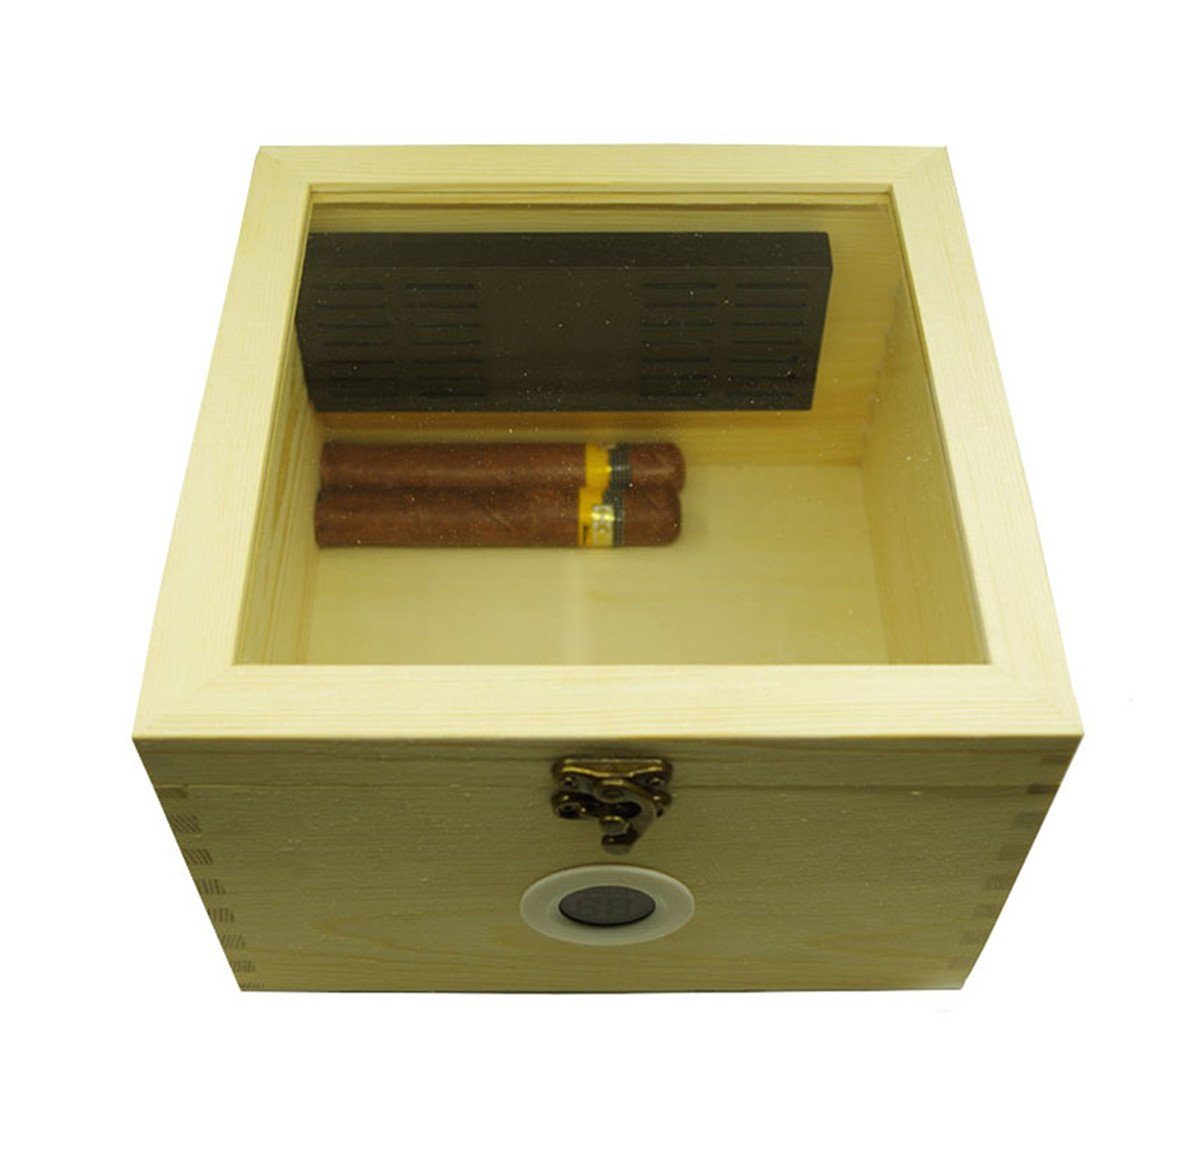 Tinzonc Beginners Cigar Moisturizing Box (7''x7''x4.7'') | Pine Cigar Box for 30 Cigars,Cigar Storage Stash Box Include Hygrometer and Humidifier